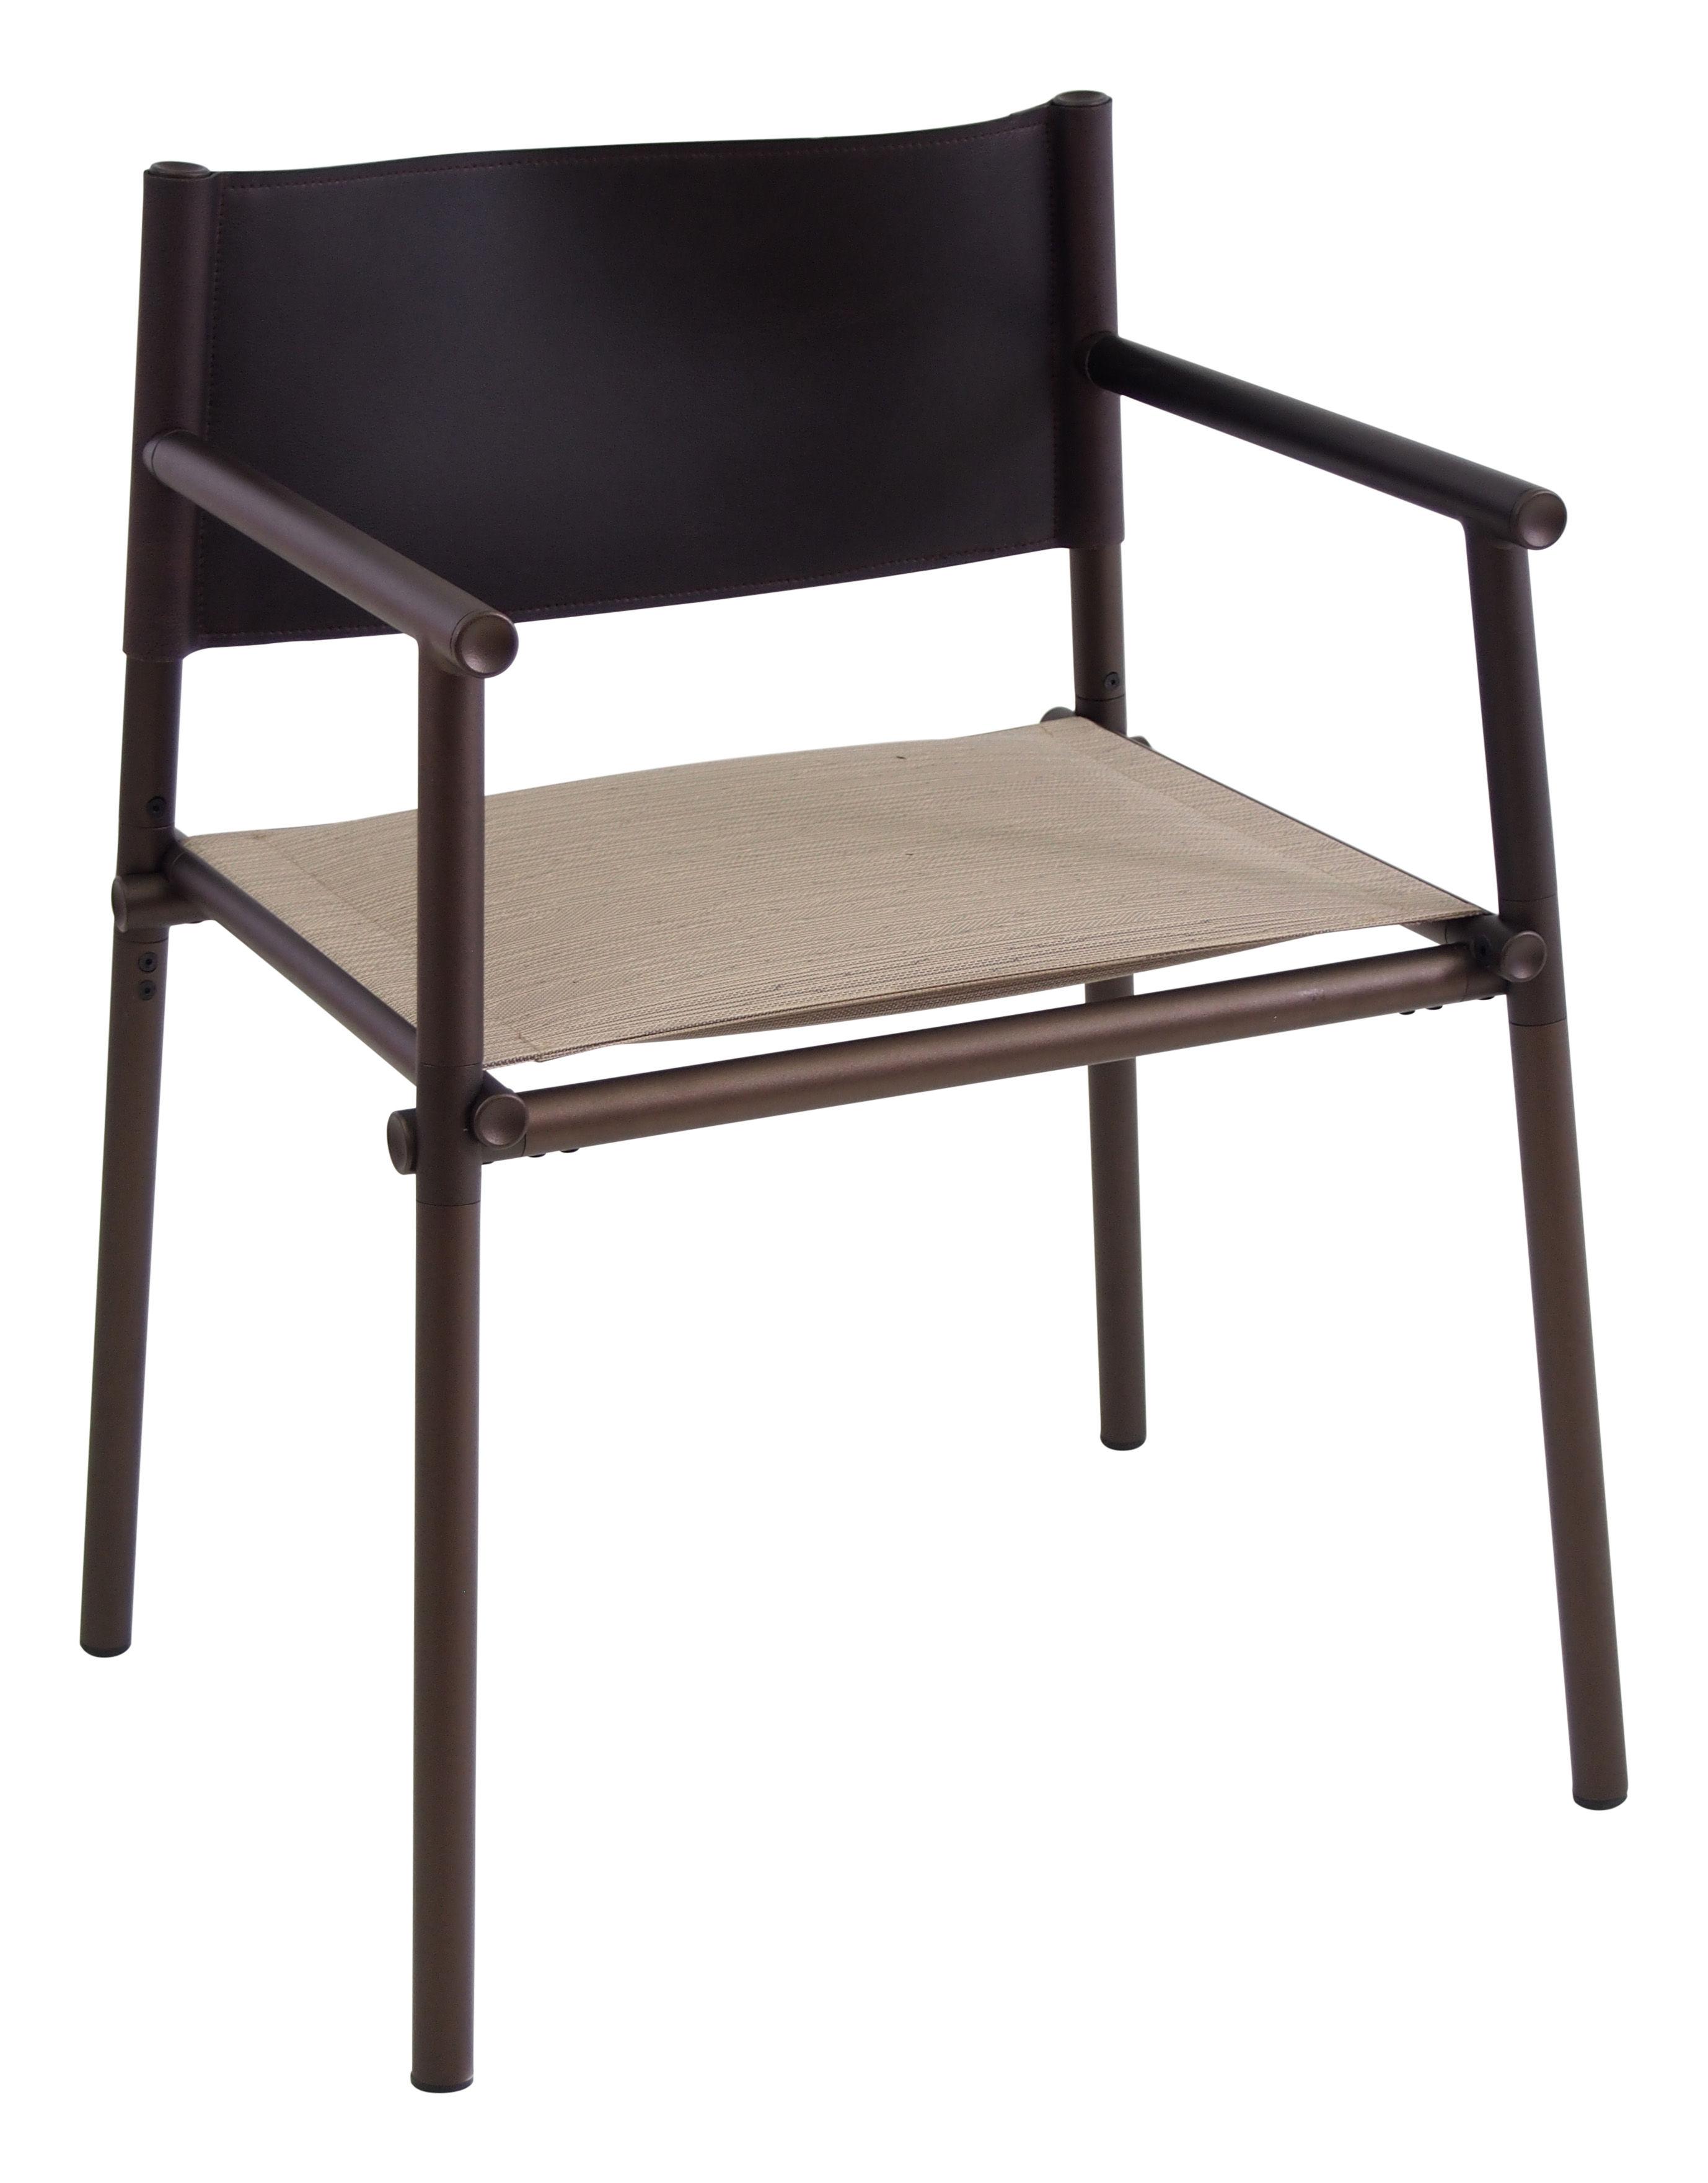 Mobilier - Chaises, fauteuils de salle à manger - Fauteuil Terramare / Similicuir & tissu - Emu - Chocolat & sable / Structure marron d'Inde - Aluminium verni, Similicuir, Tissu Emu Tex